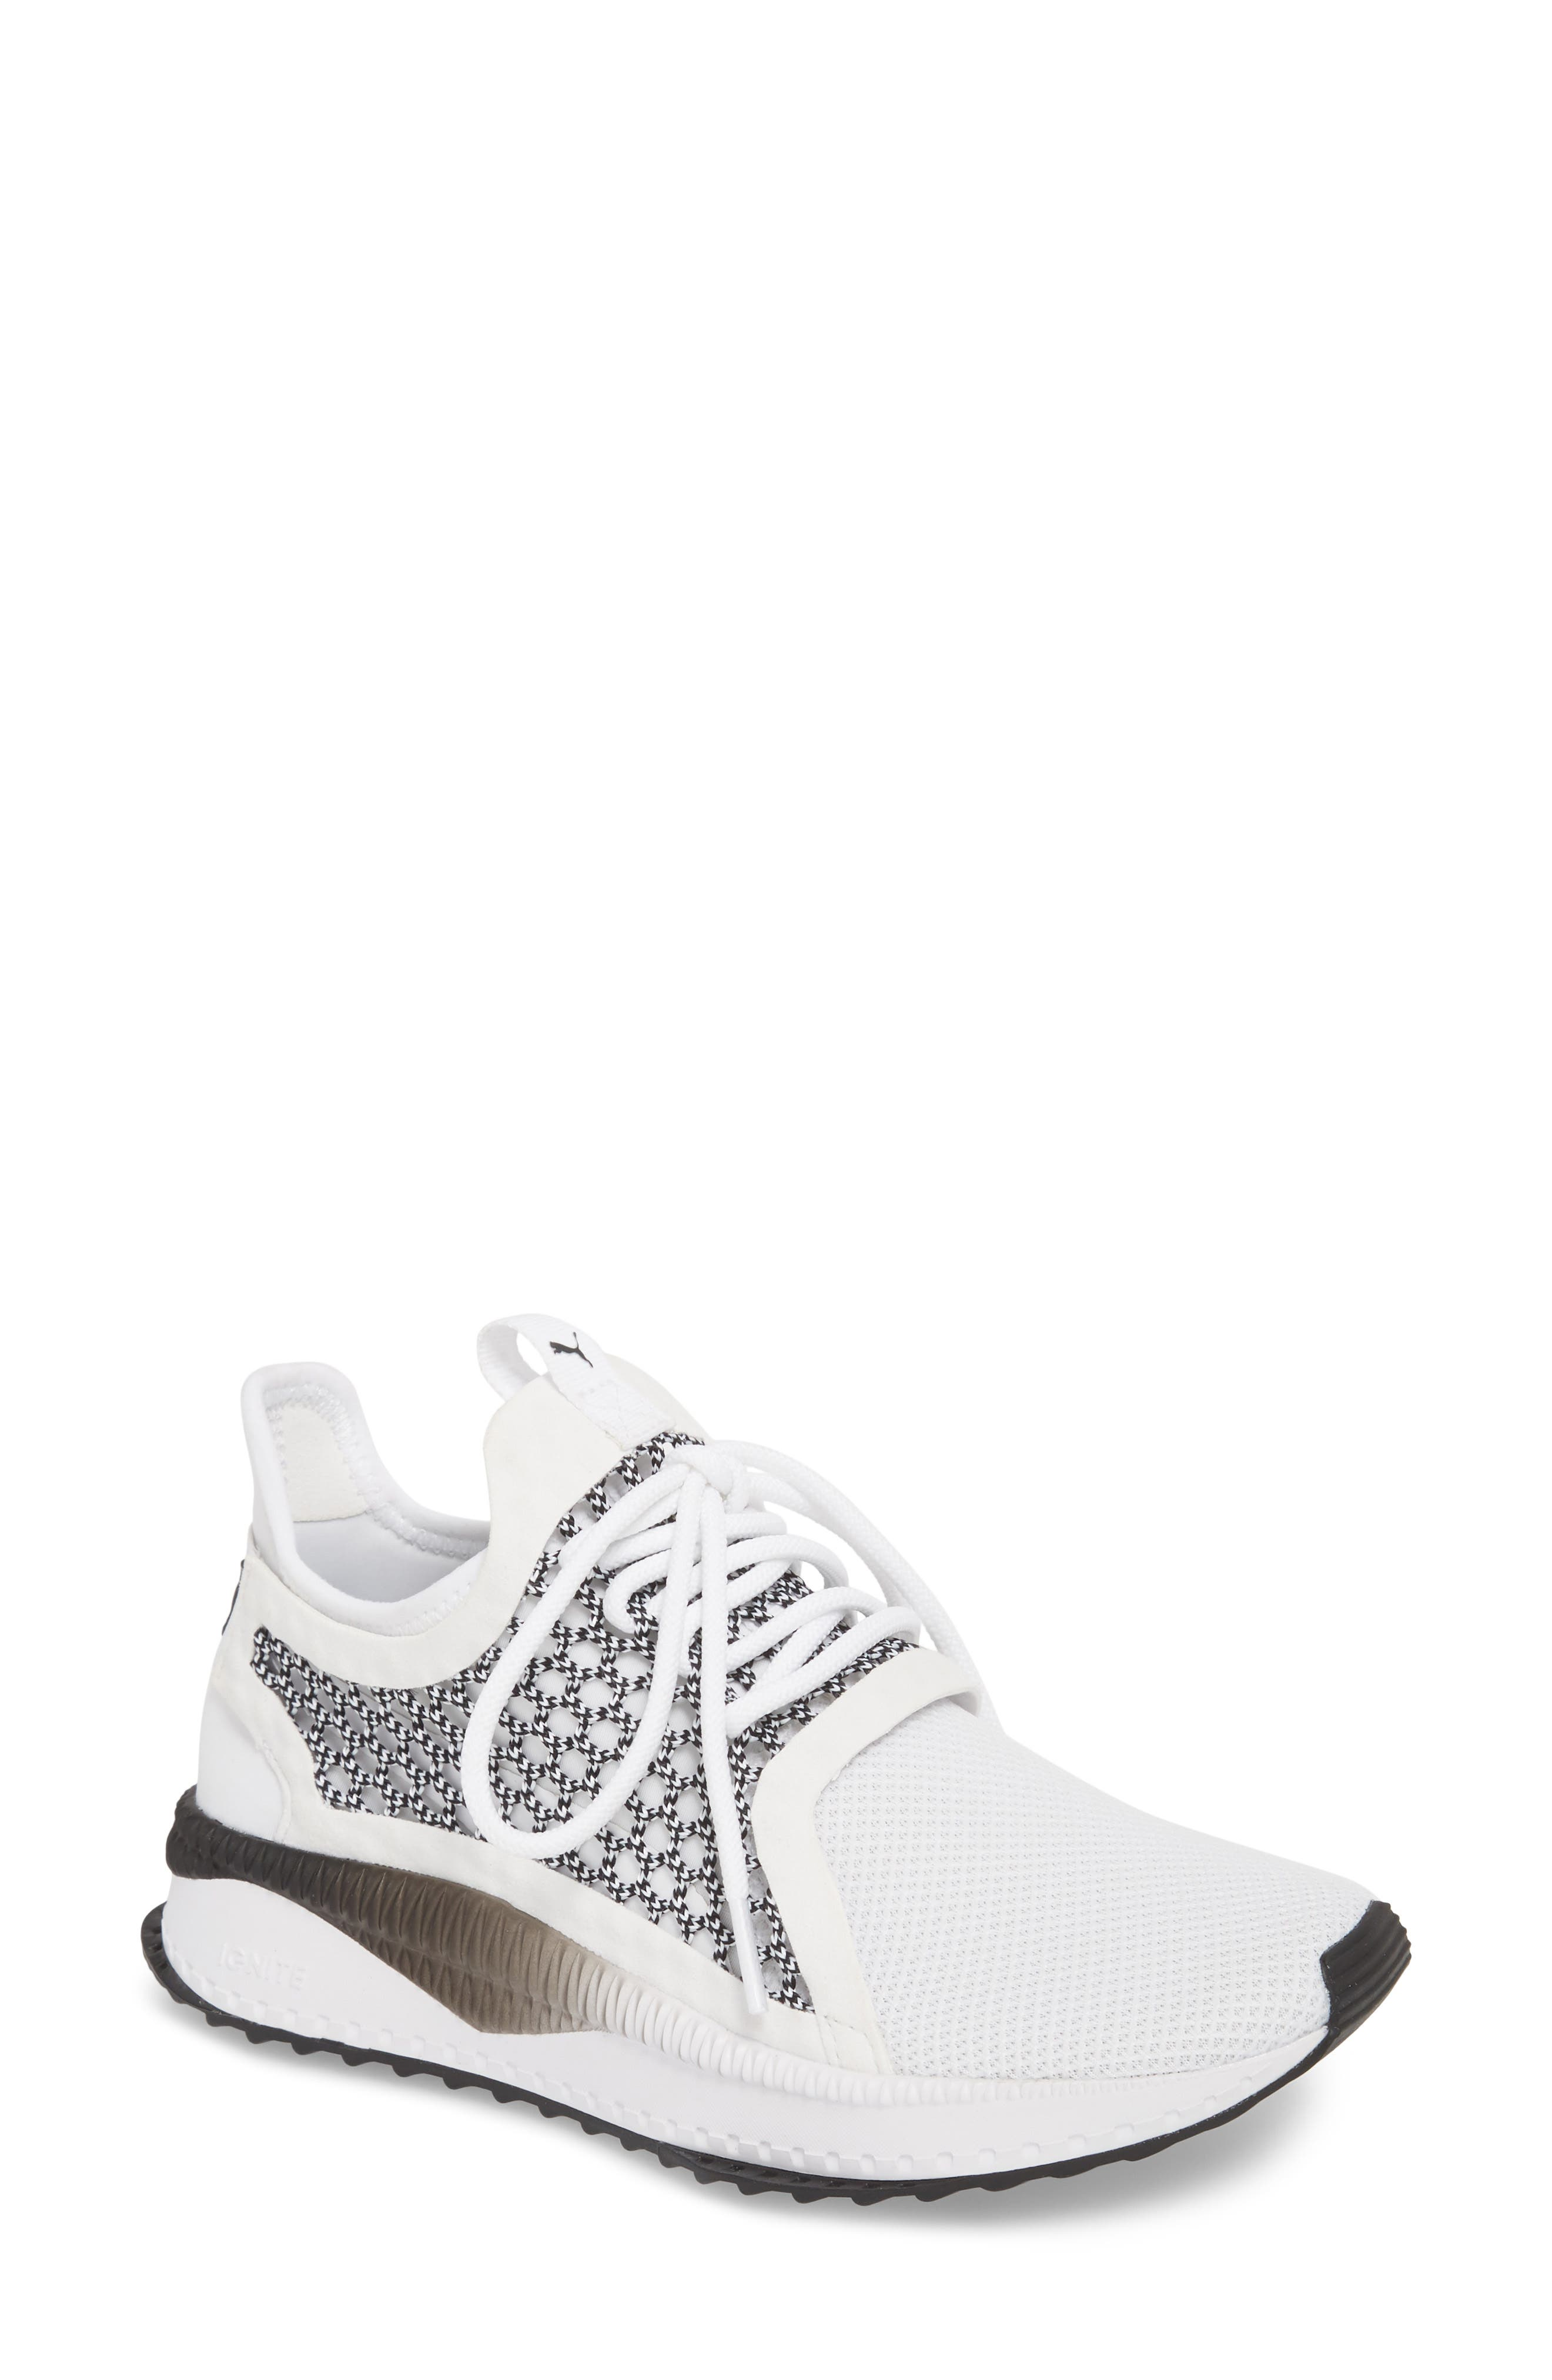 PUMA Tsugi Netfit evoKNIT Training Shoe, Main, color, 100